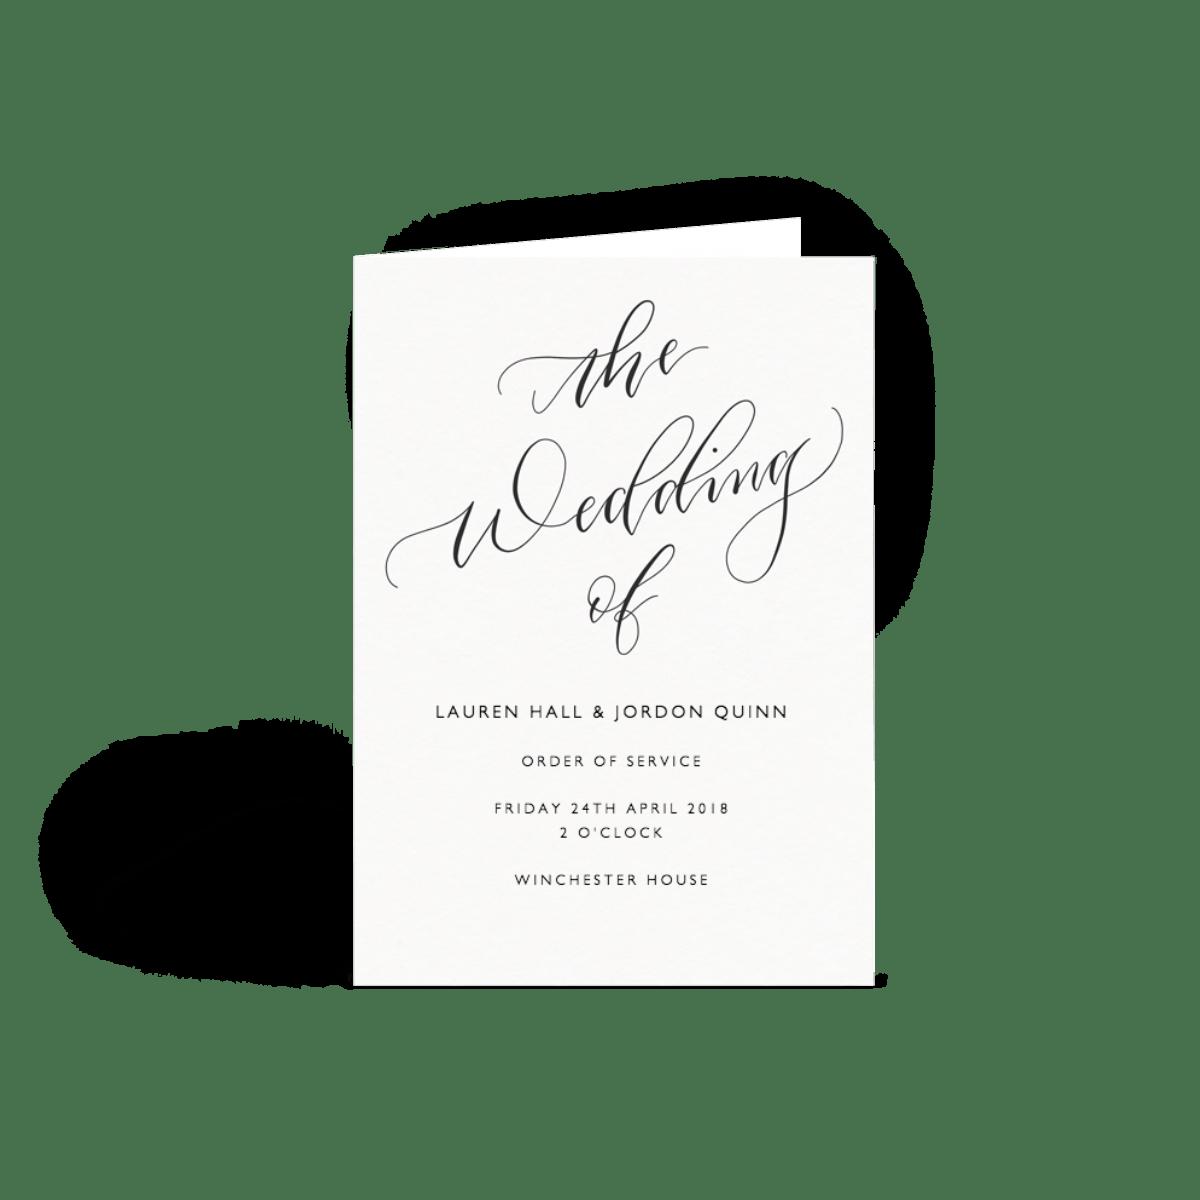 Wedding Order Of Service.Order Of Service Cards Wedding Programs Papier